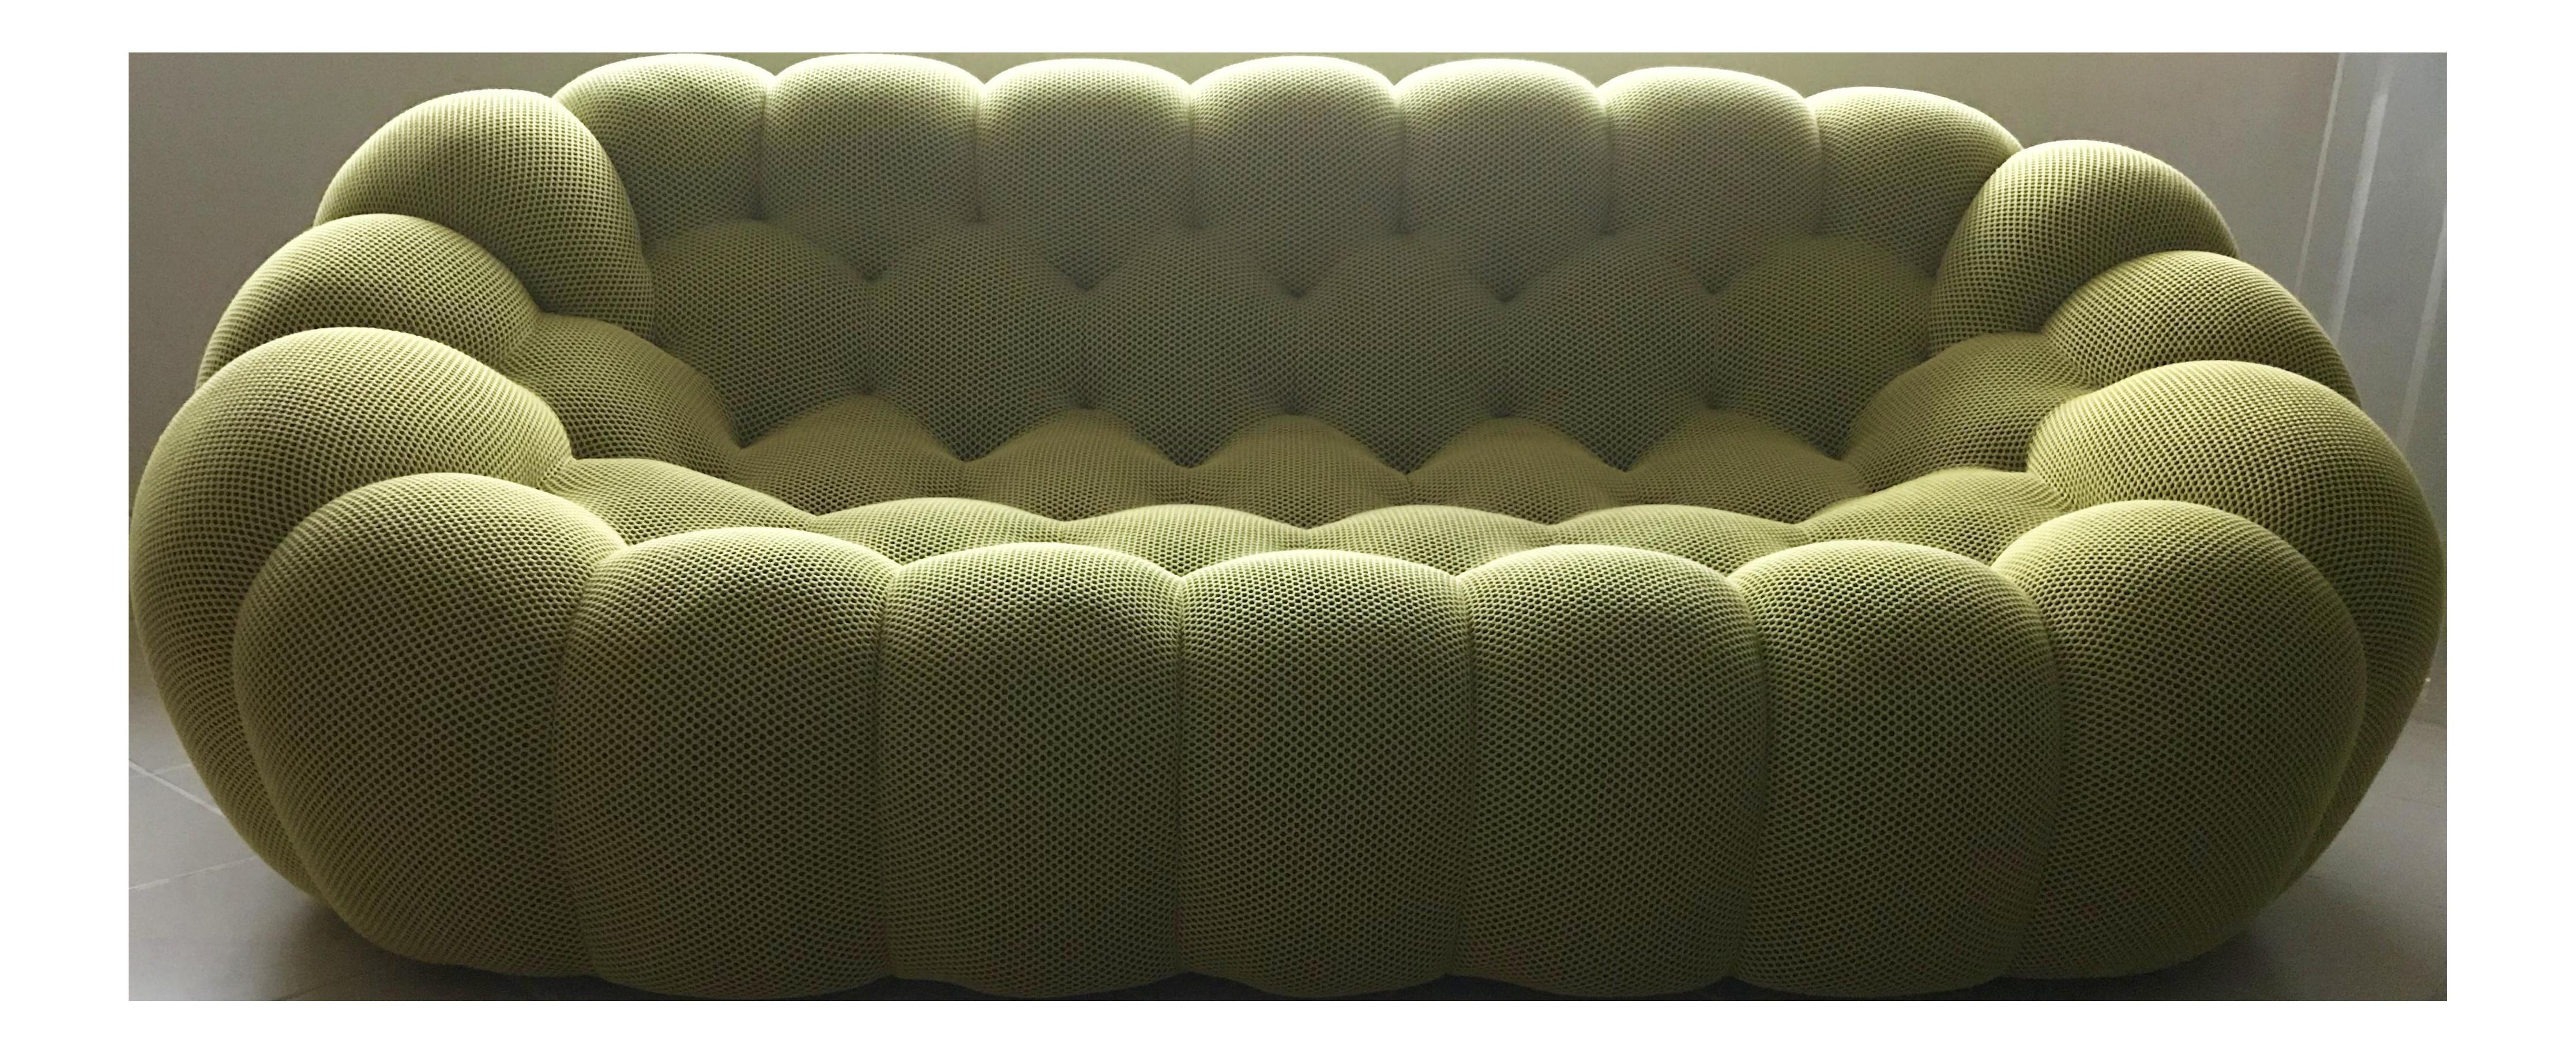 Bubble Sofa Roche Bobois bubble sofa by sacha lakic for roche bobois